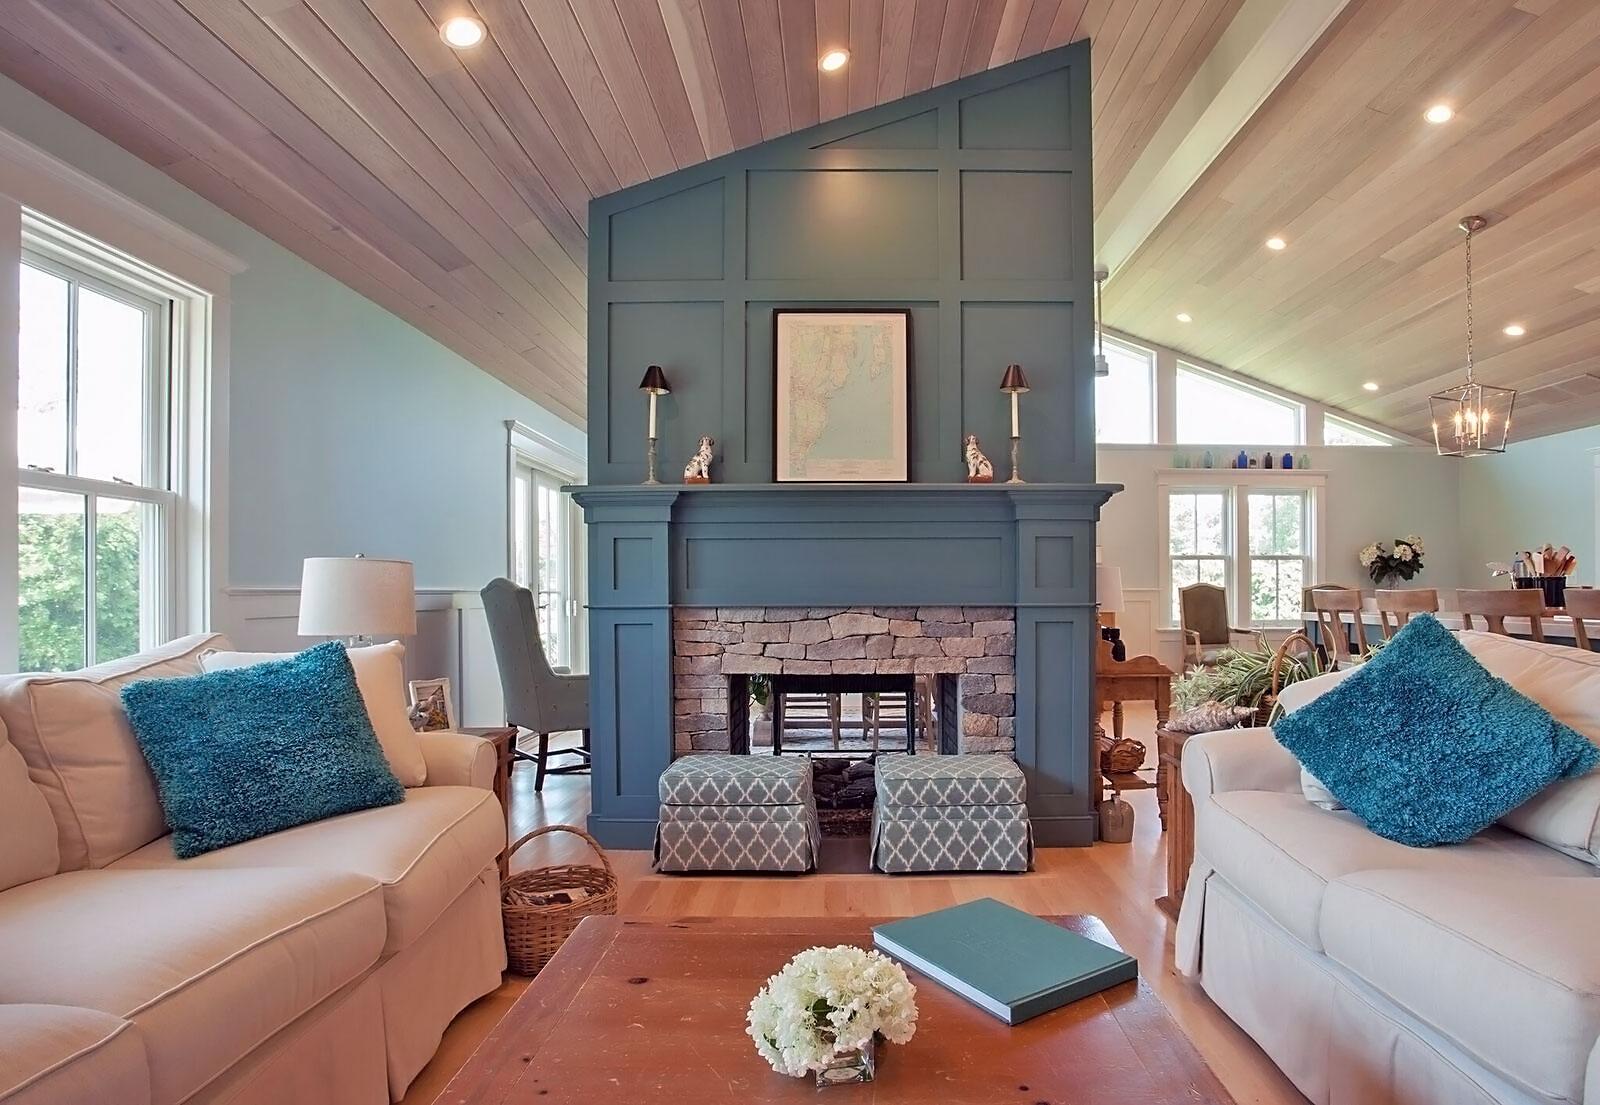 Stephen-Sullivan-Inc-Custom-Home-Builders-Rhode-Island-Narrow-River-Cottage---5